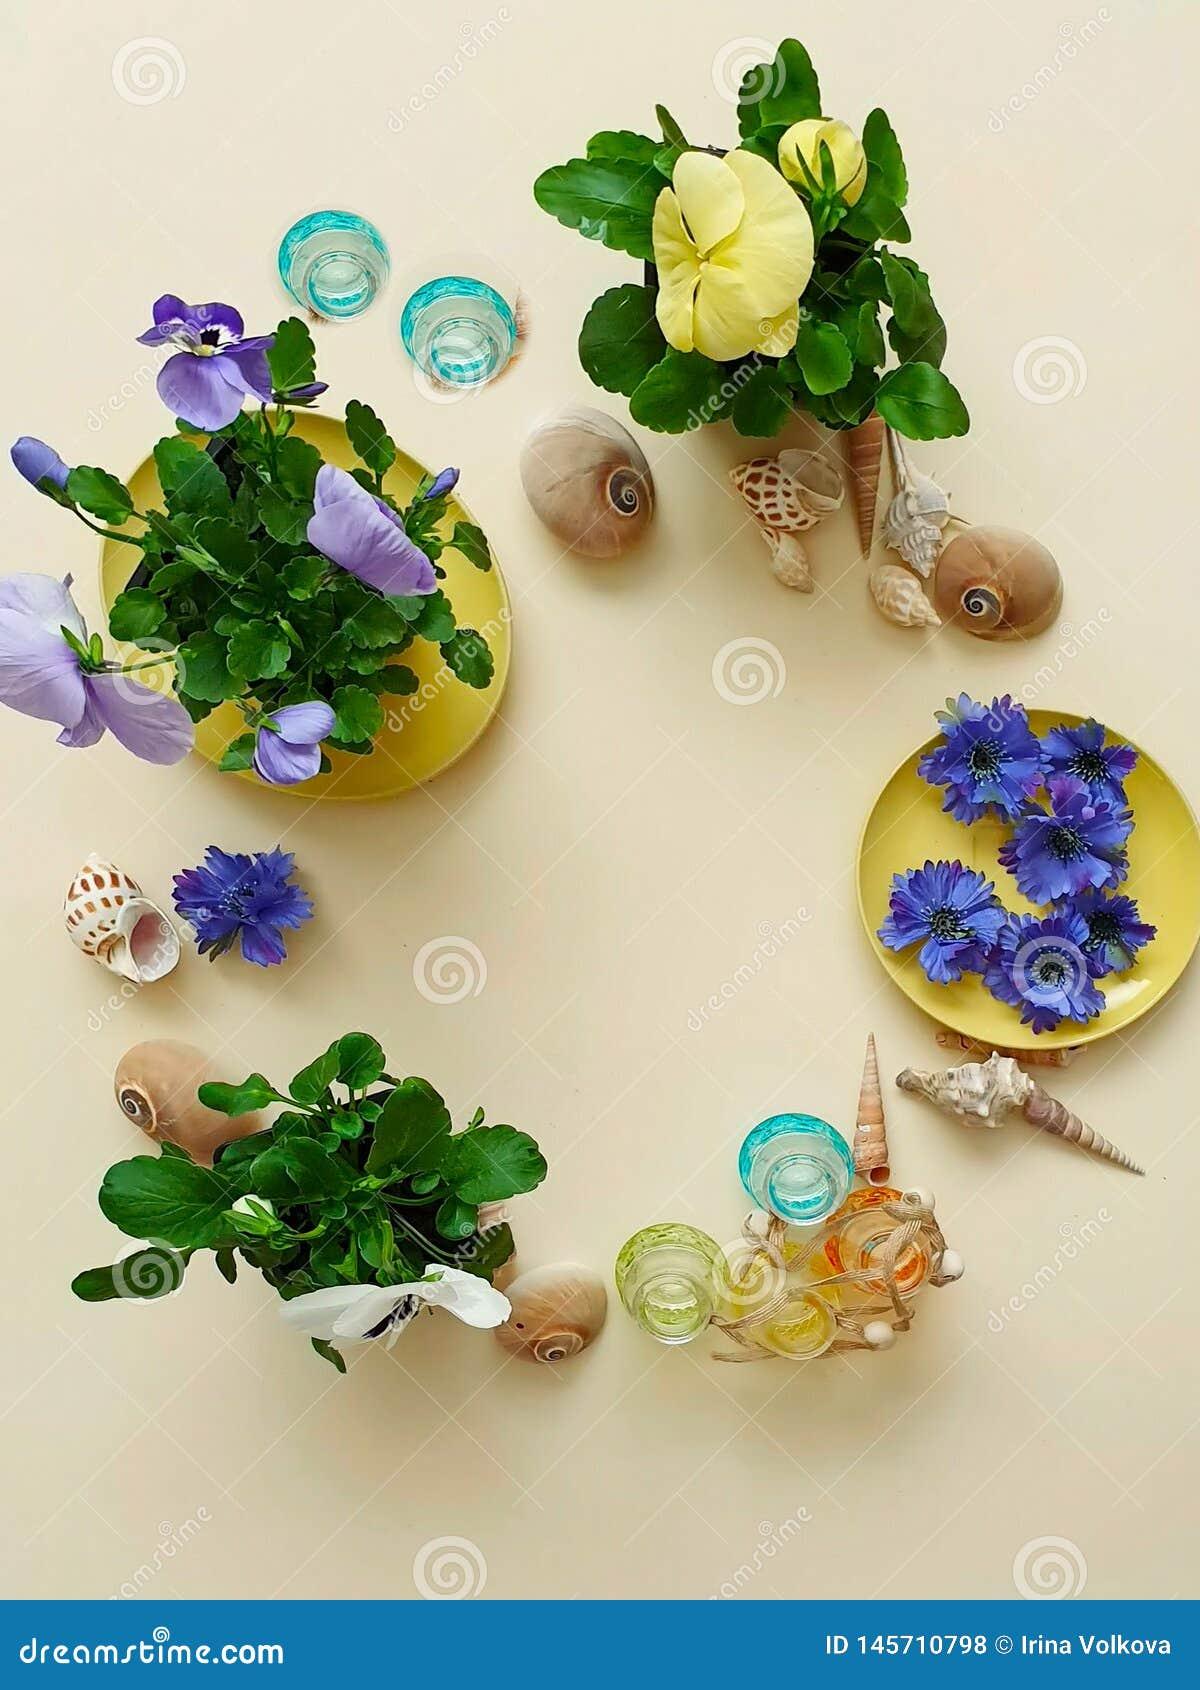 sea stones shells flowers wreath garland crown chaplet coronet